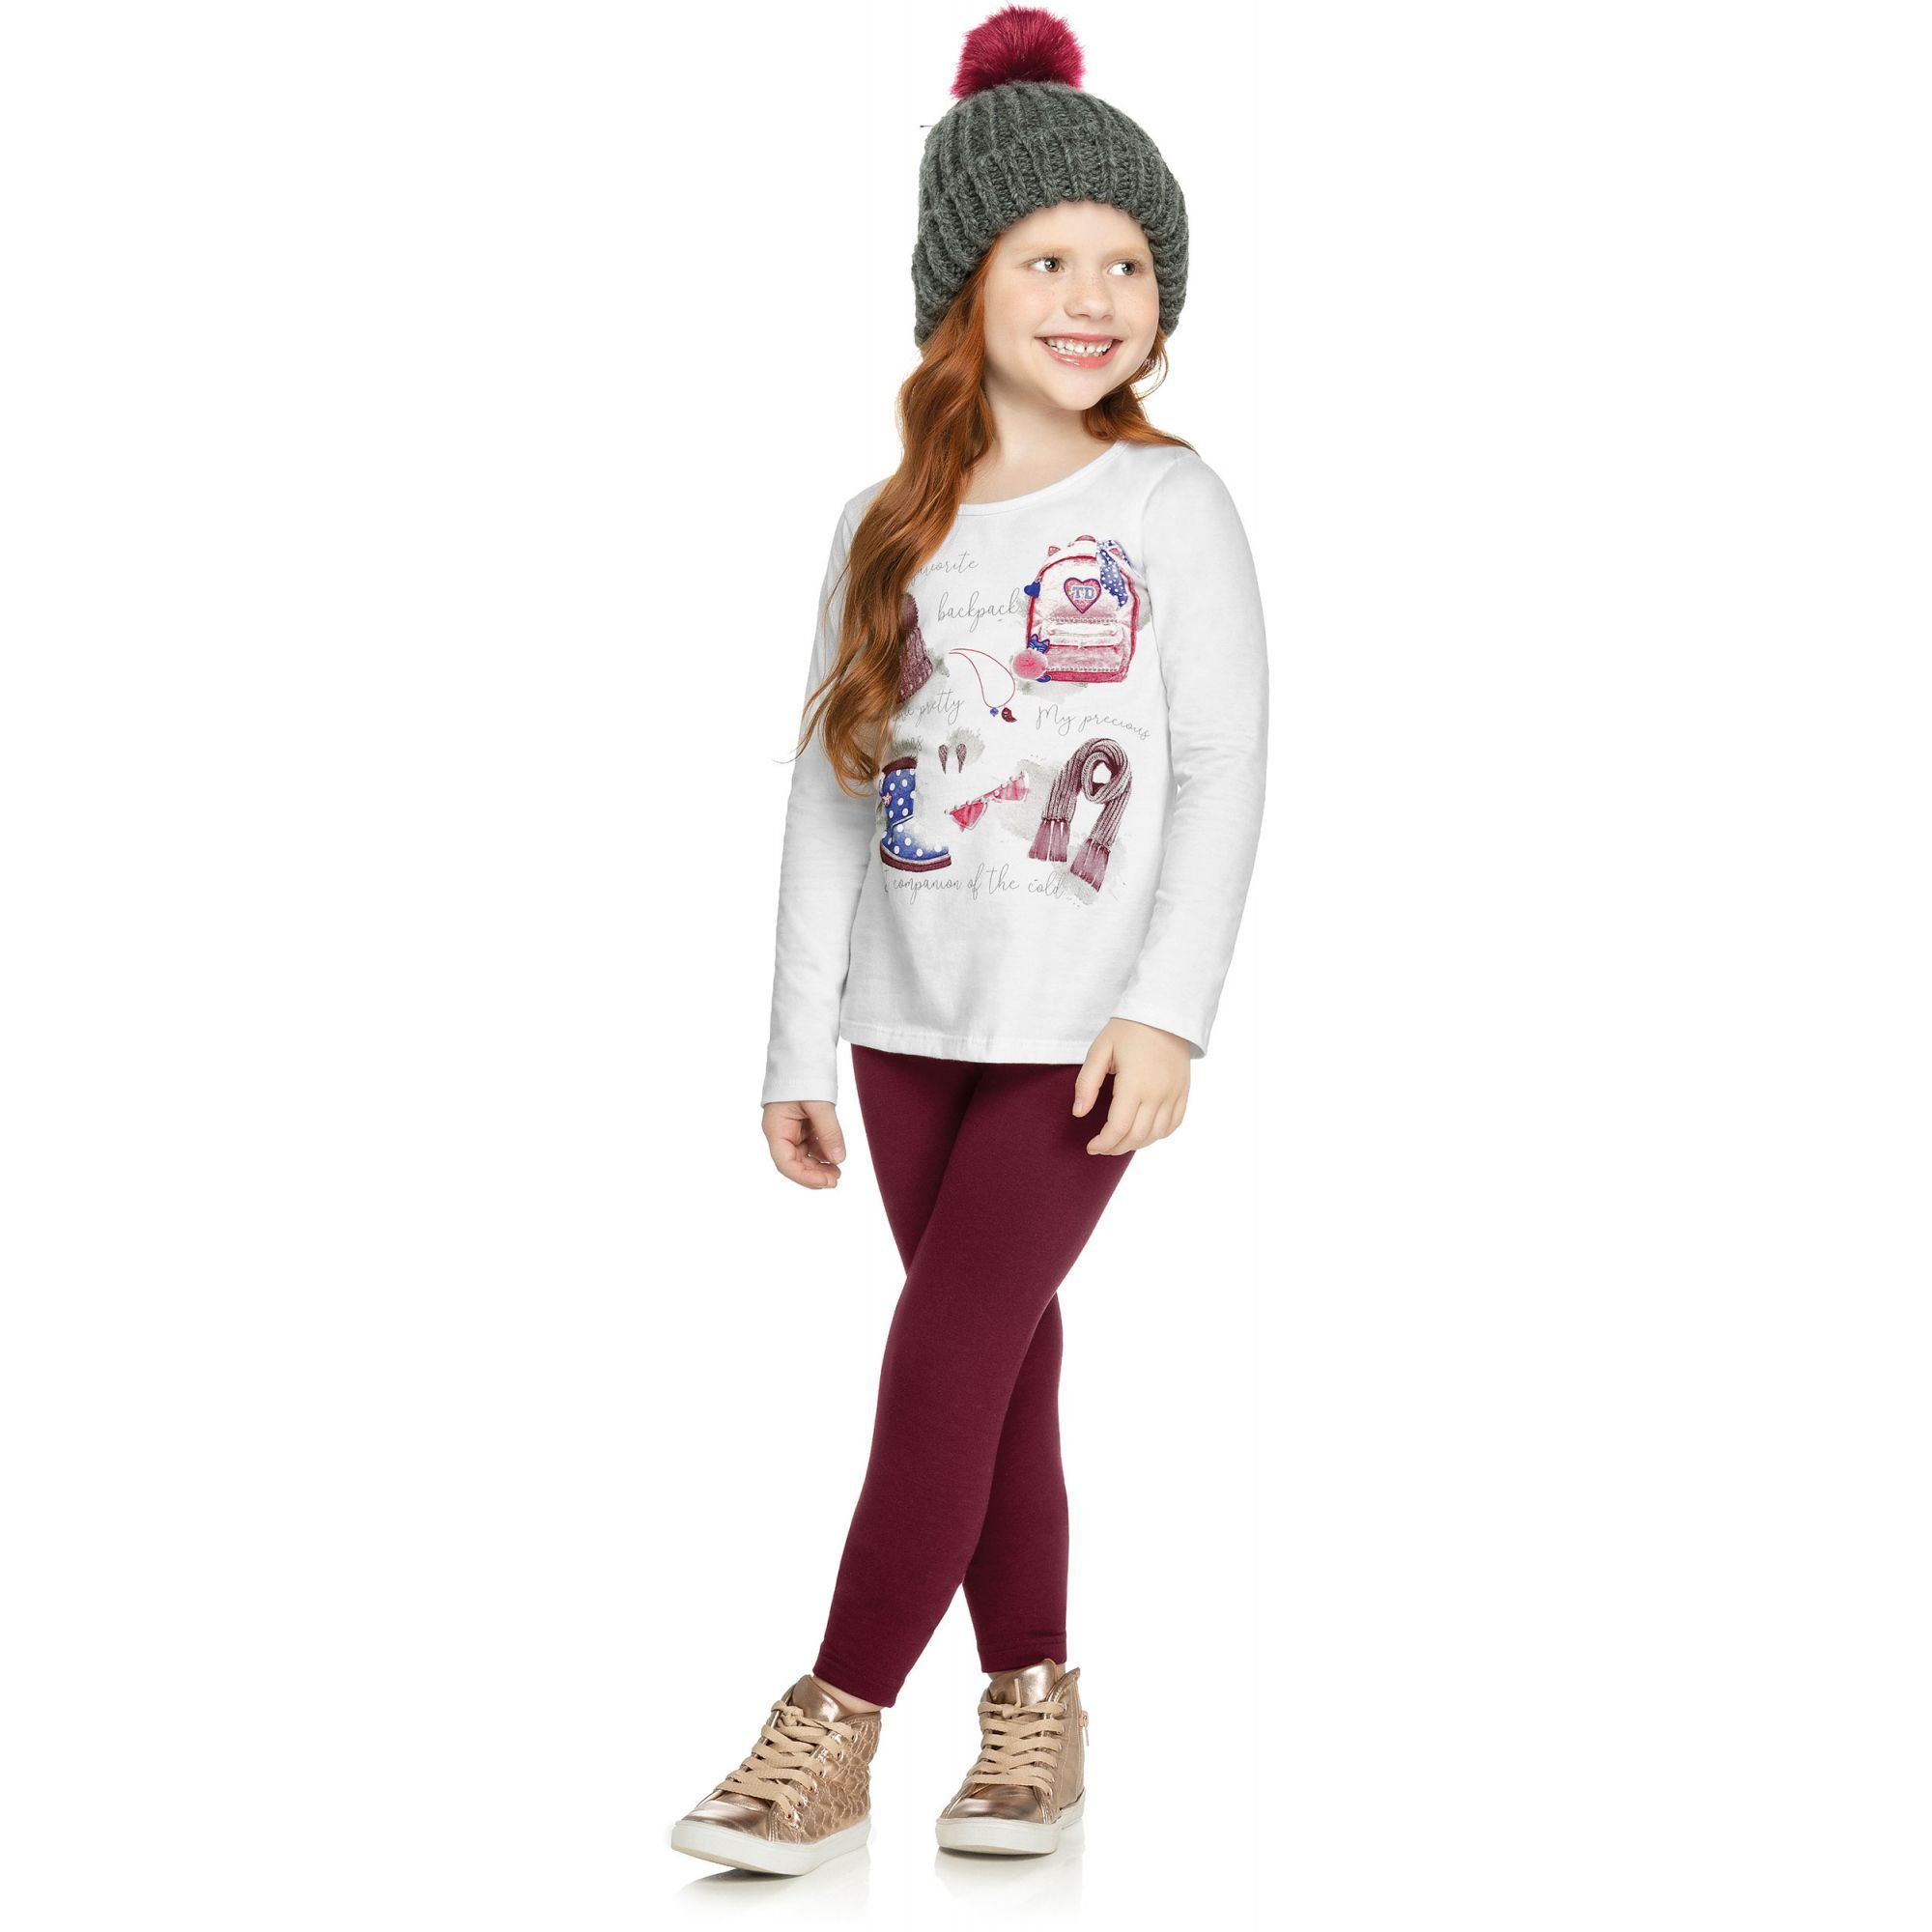 Conjunto Infantil Feminino Inverno Branco My Favorite Elian